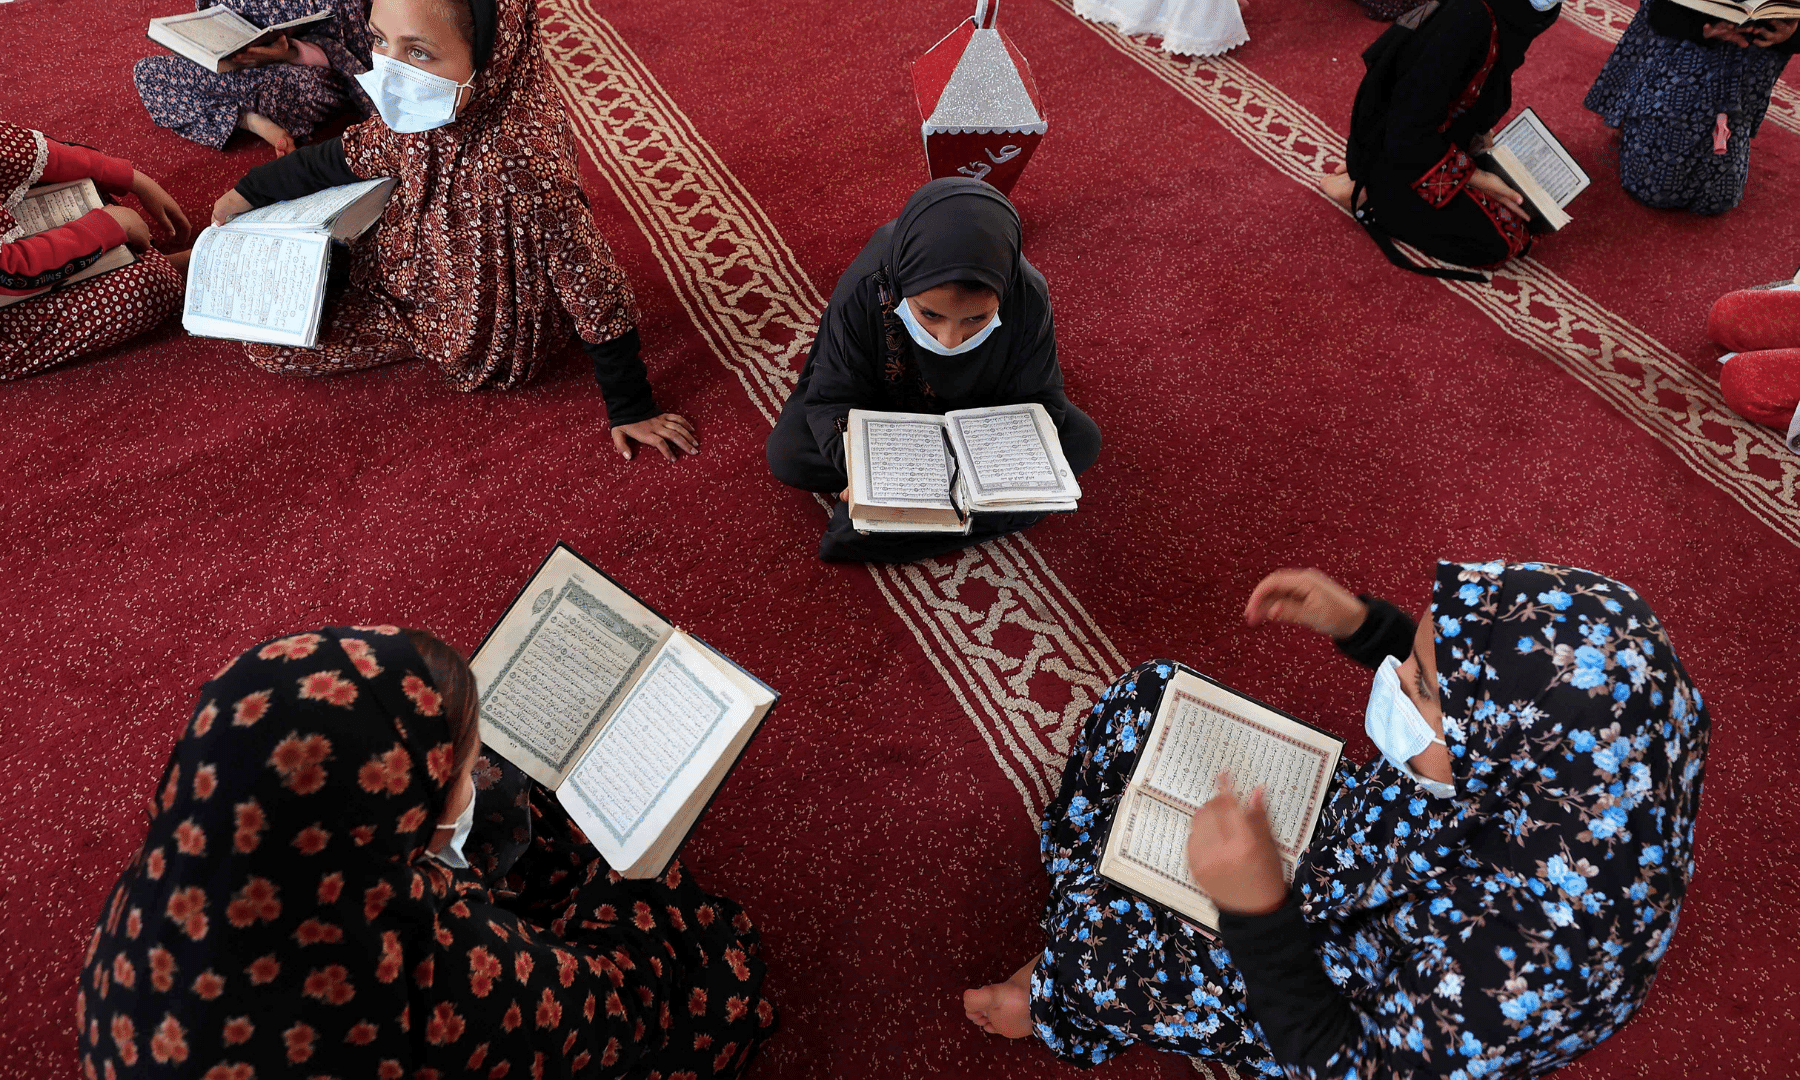 Young Palestinian girls wearing face masks due to the coronavirus pandemic, read the Quran during Ramazan, in Gaza City. — AFP